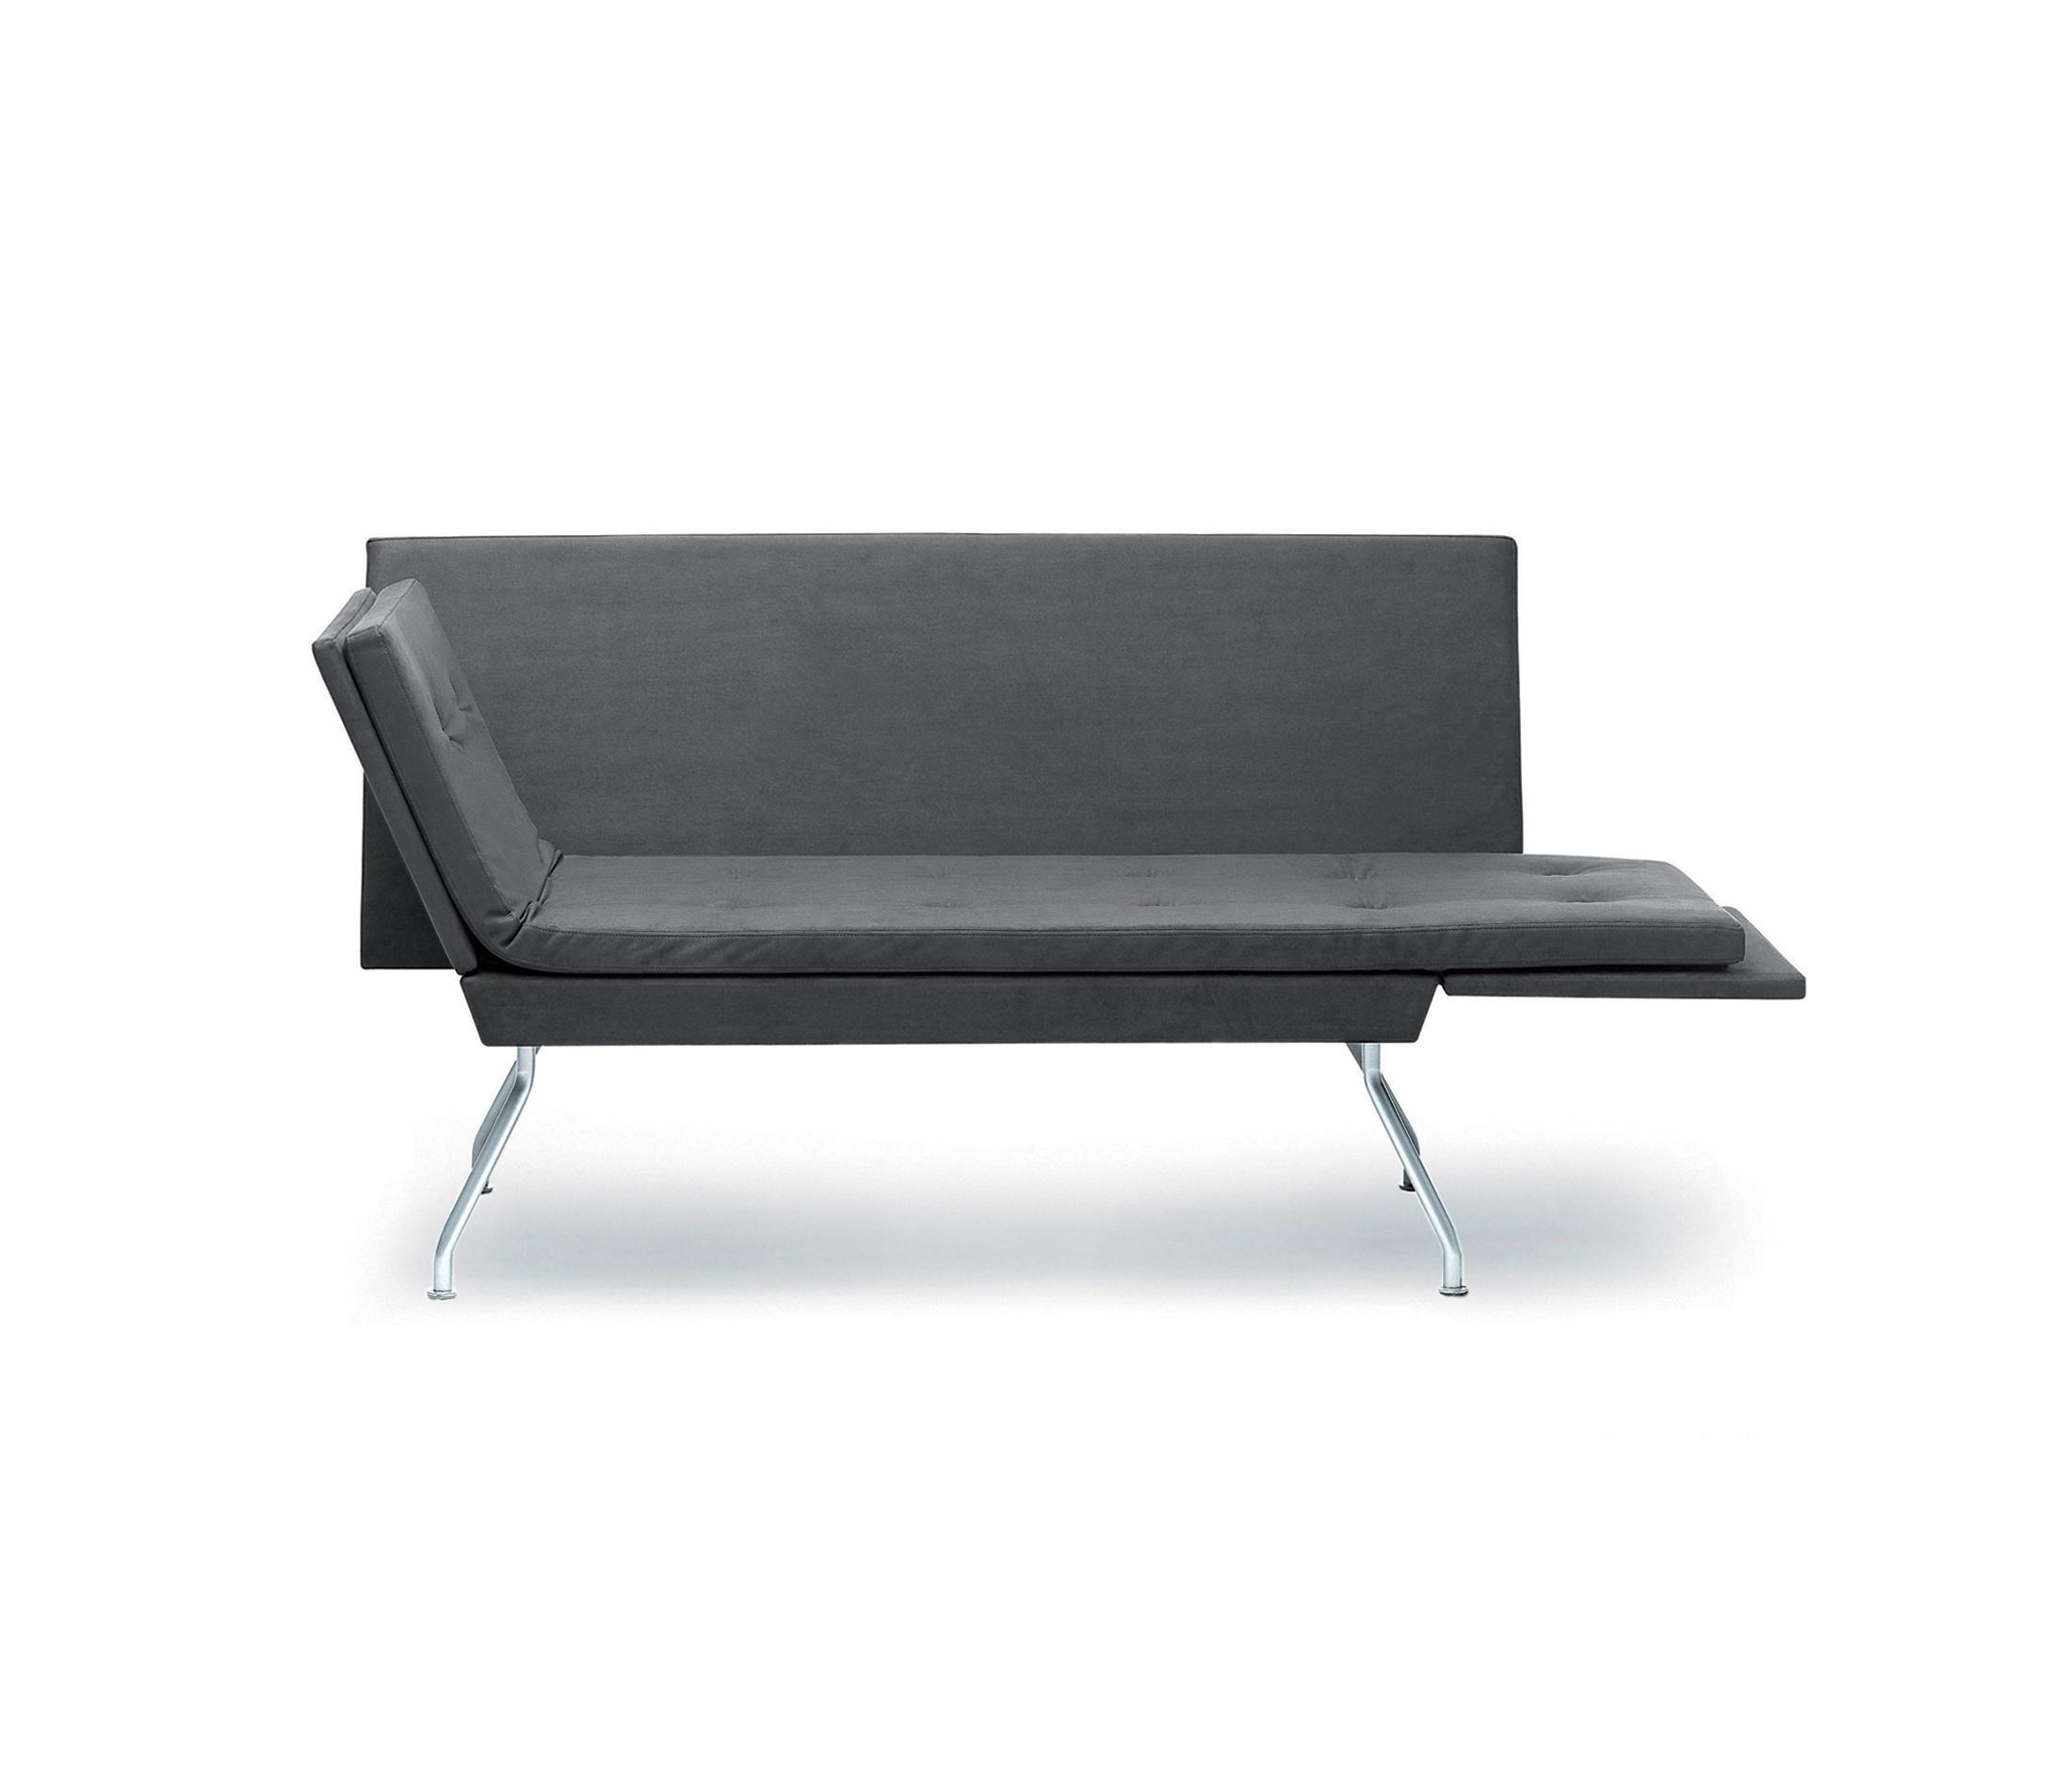 Tremendous Avec Sofa Sofas From Materia Architonic Creativecarmelina Interior Chair Design Creativecarmelinacom